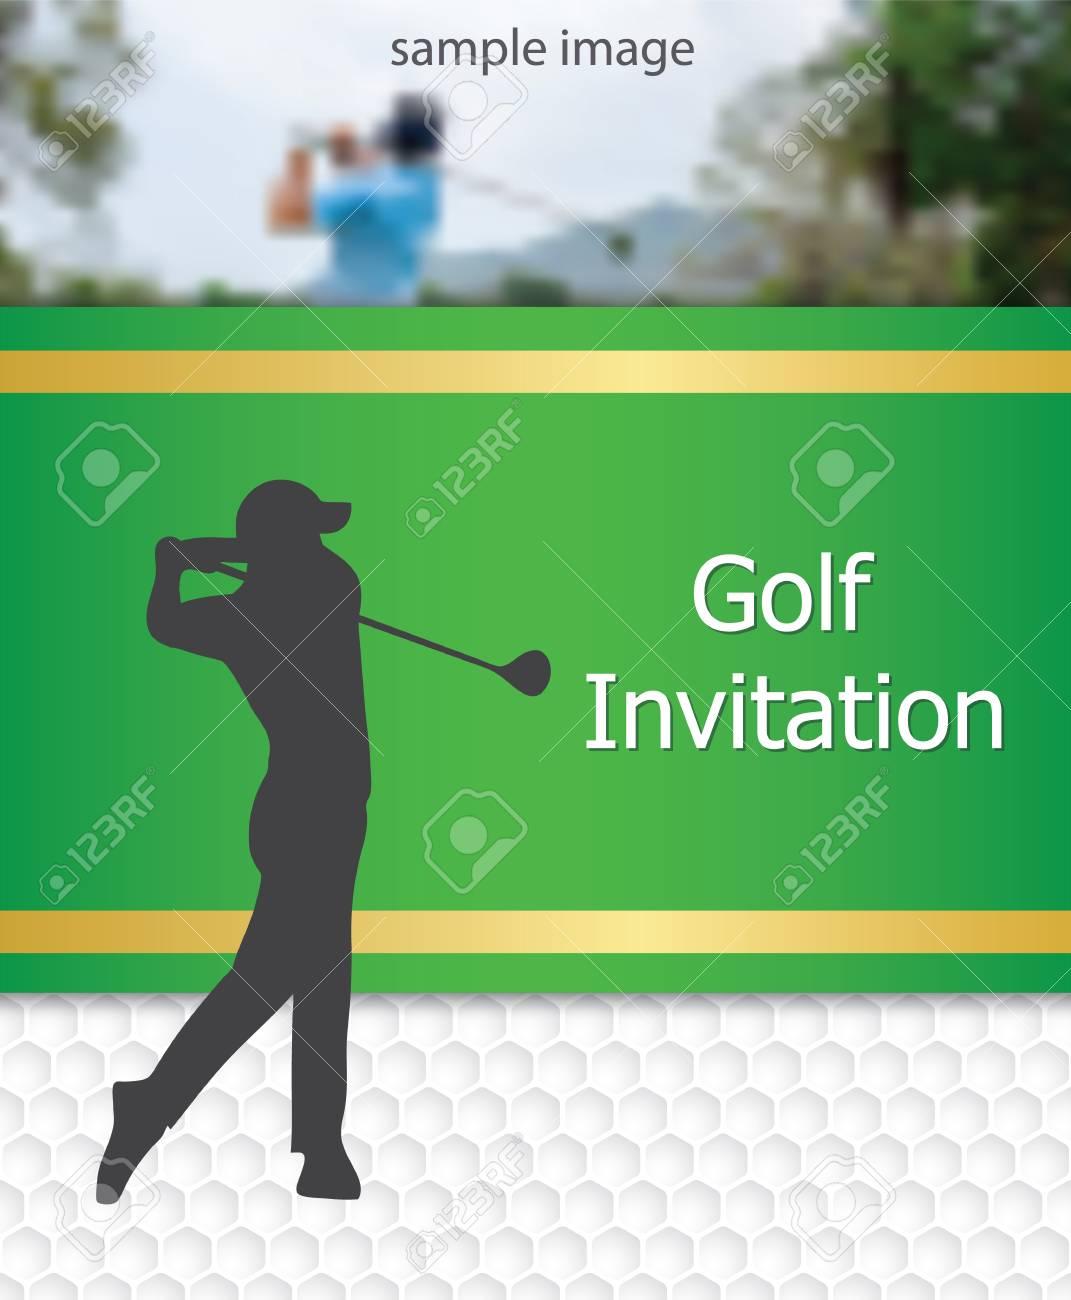 Golf Tournament Invitation Flyer Template Graphic Design Golfer - Golf tournament flyer template